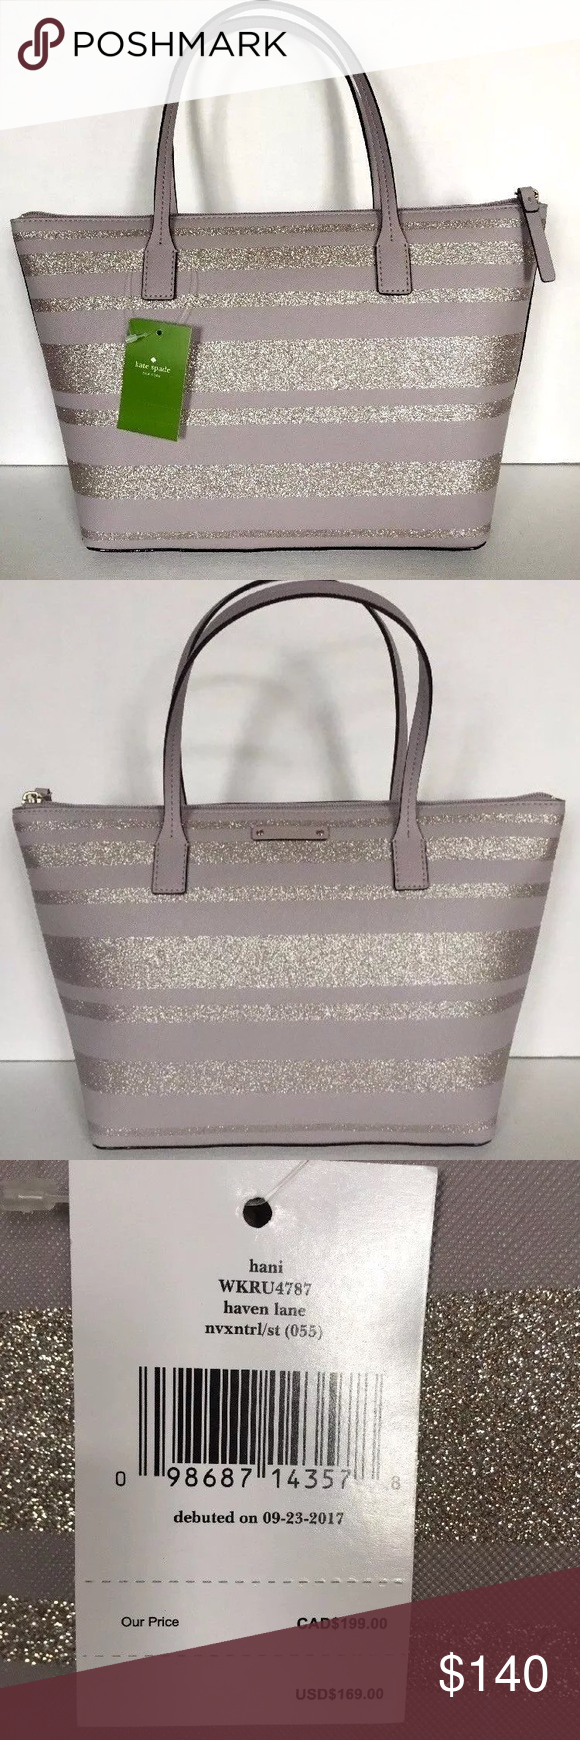 Nwt Kate Spade Hani Haven Lane Tote Nouveau Bag Kate Spade Tote Bag Designer Deals Tote